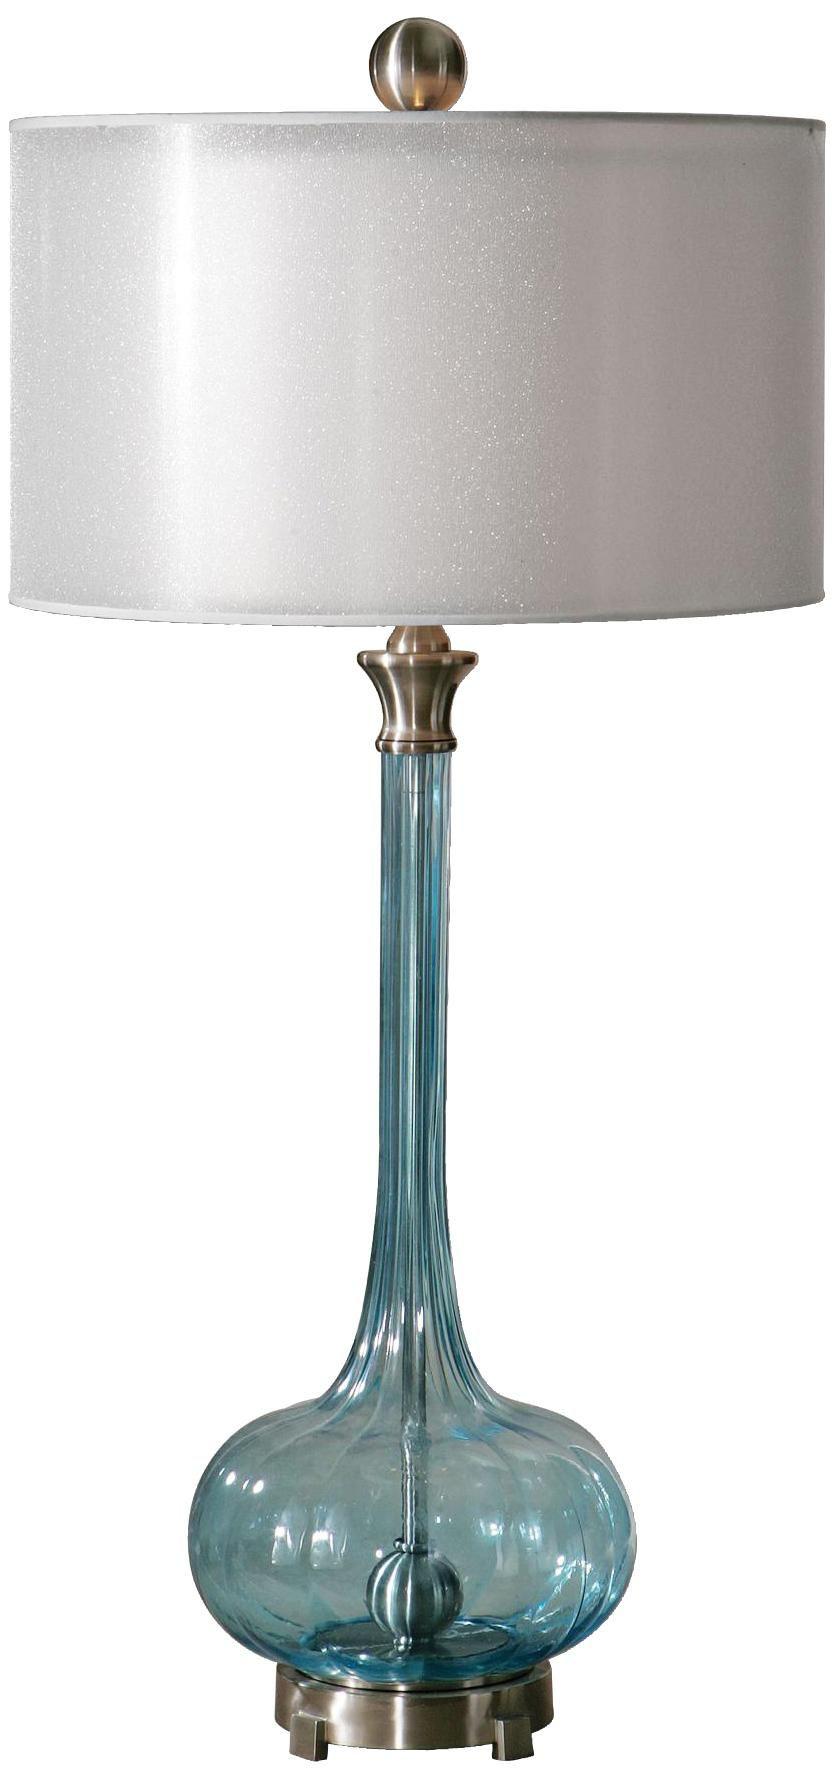 Uttermost Junelle Blue Glass Table Lamp